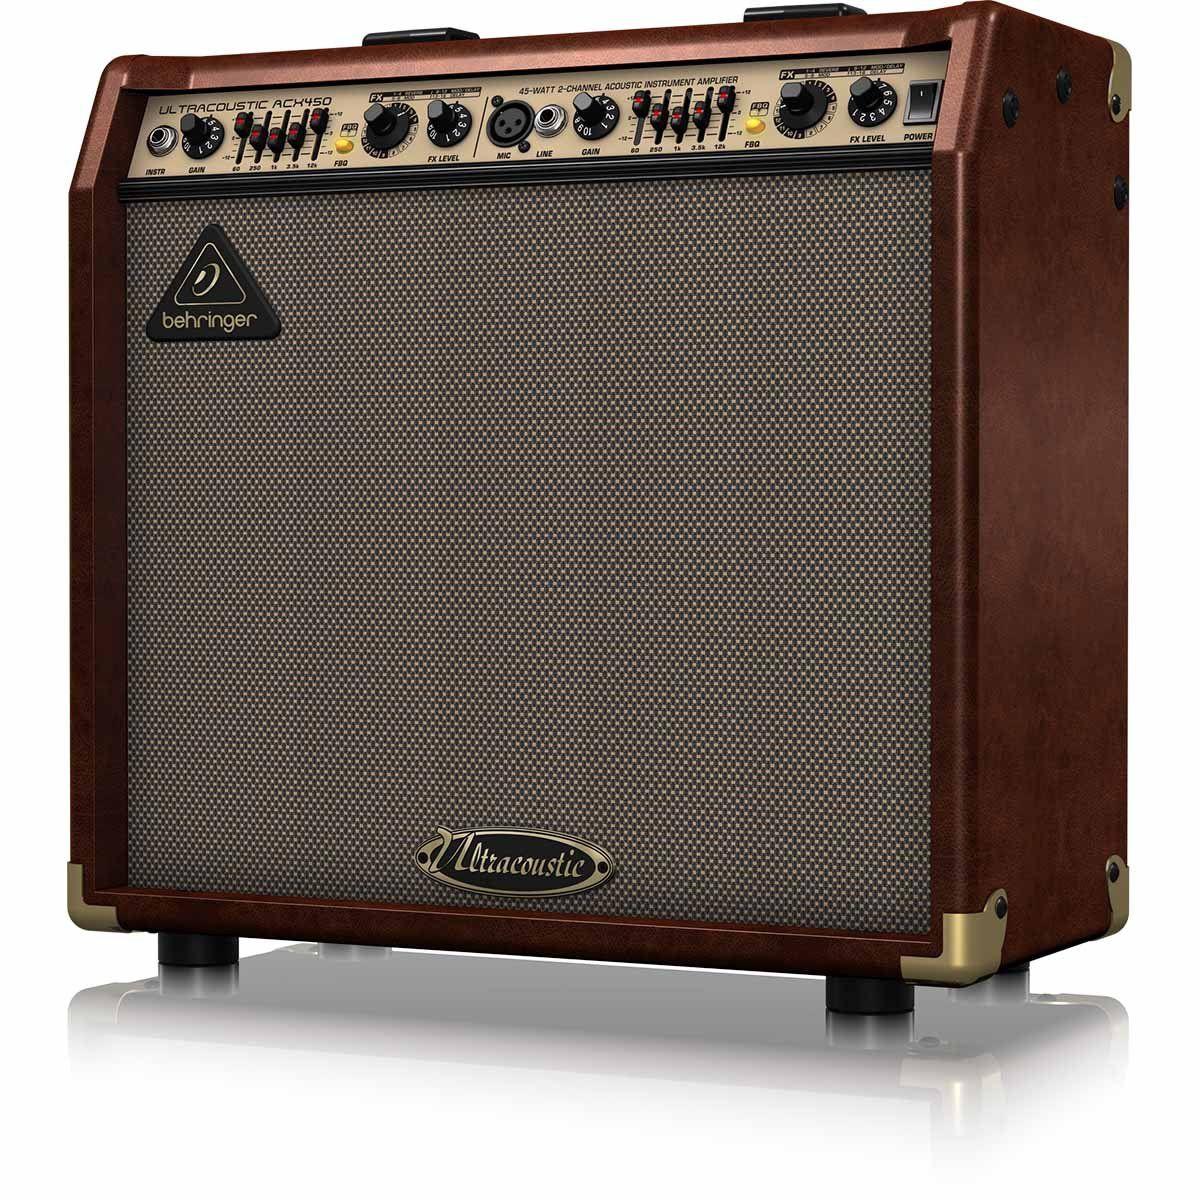 amplificador behringer ultracoustic acx450 review. Black Bedroom Furniture Sets. Home Design Ideas